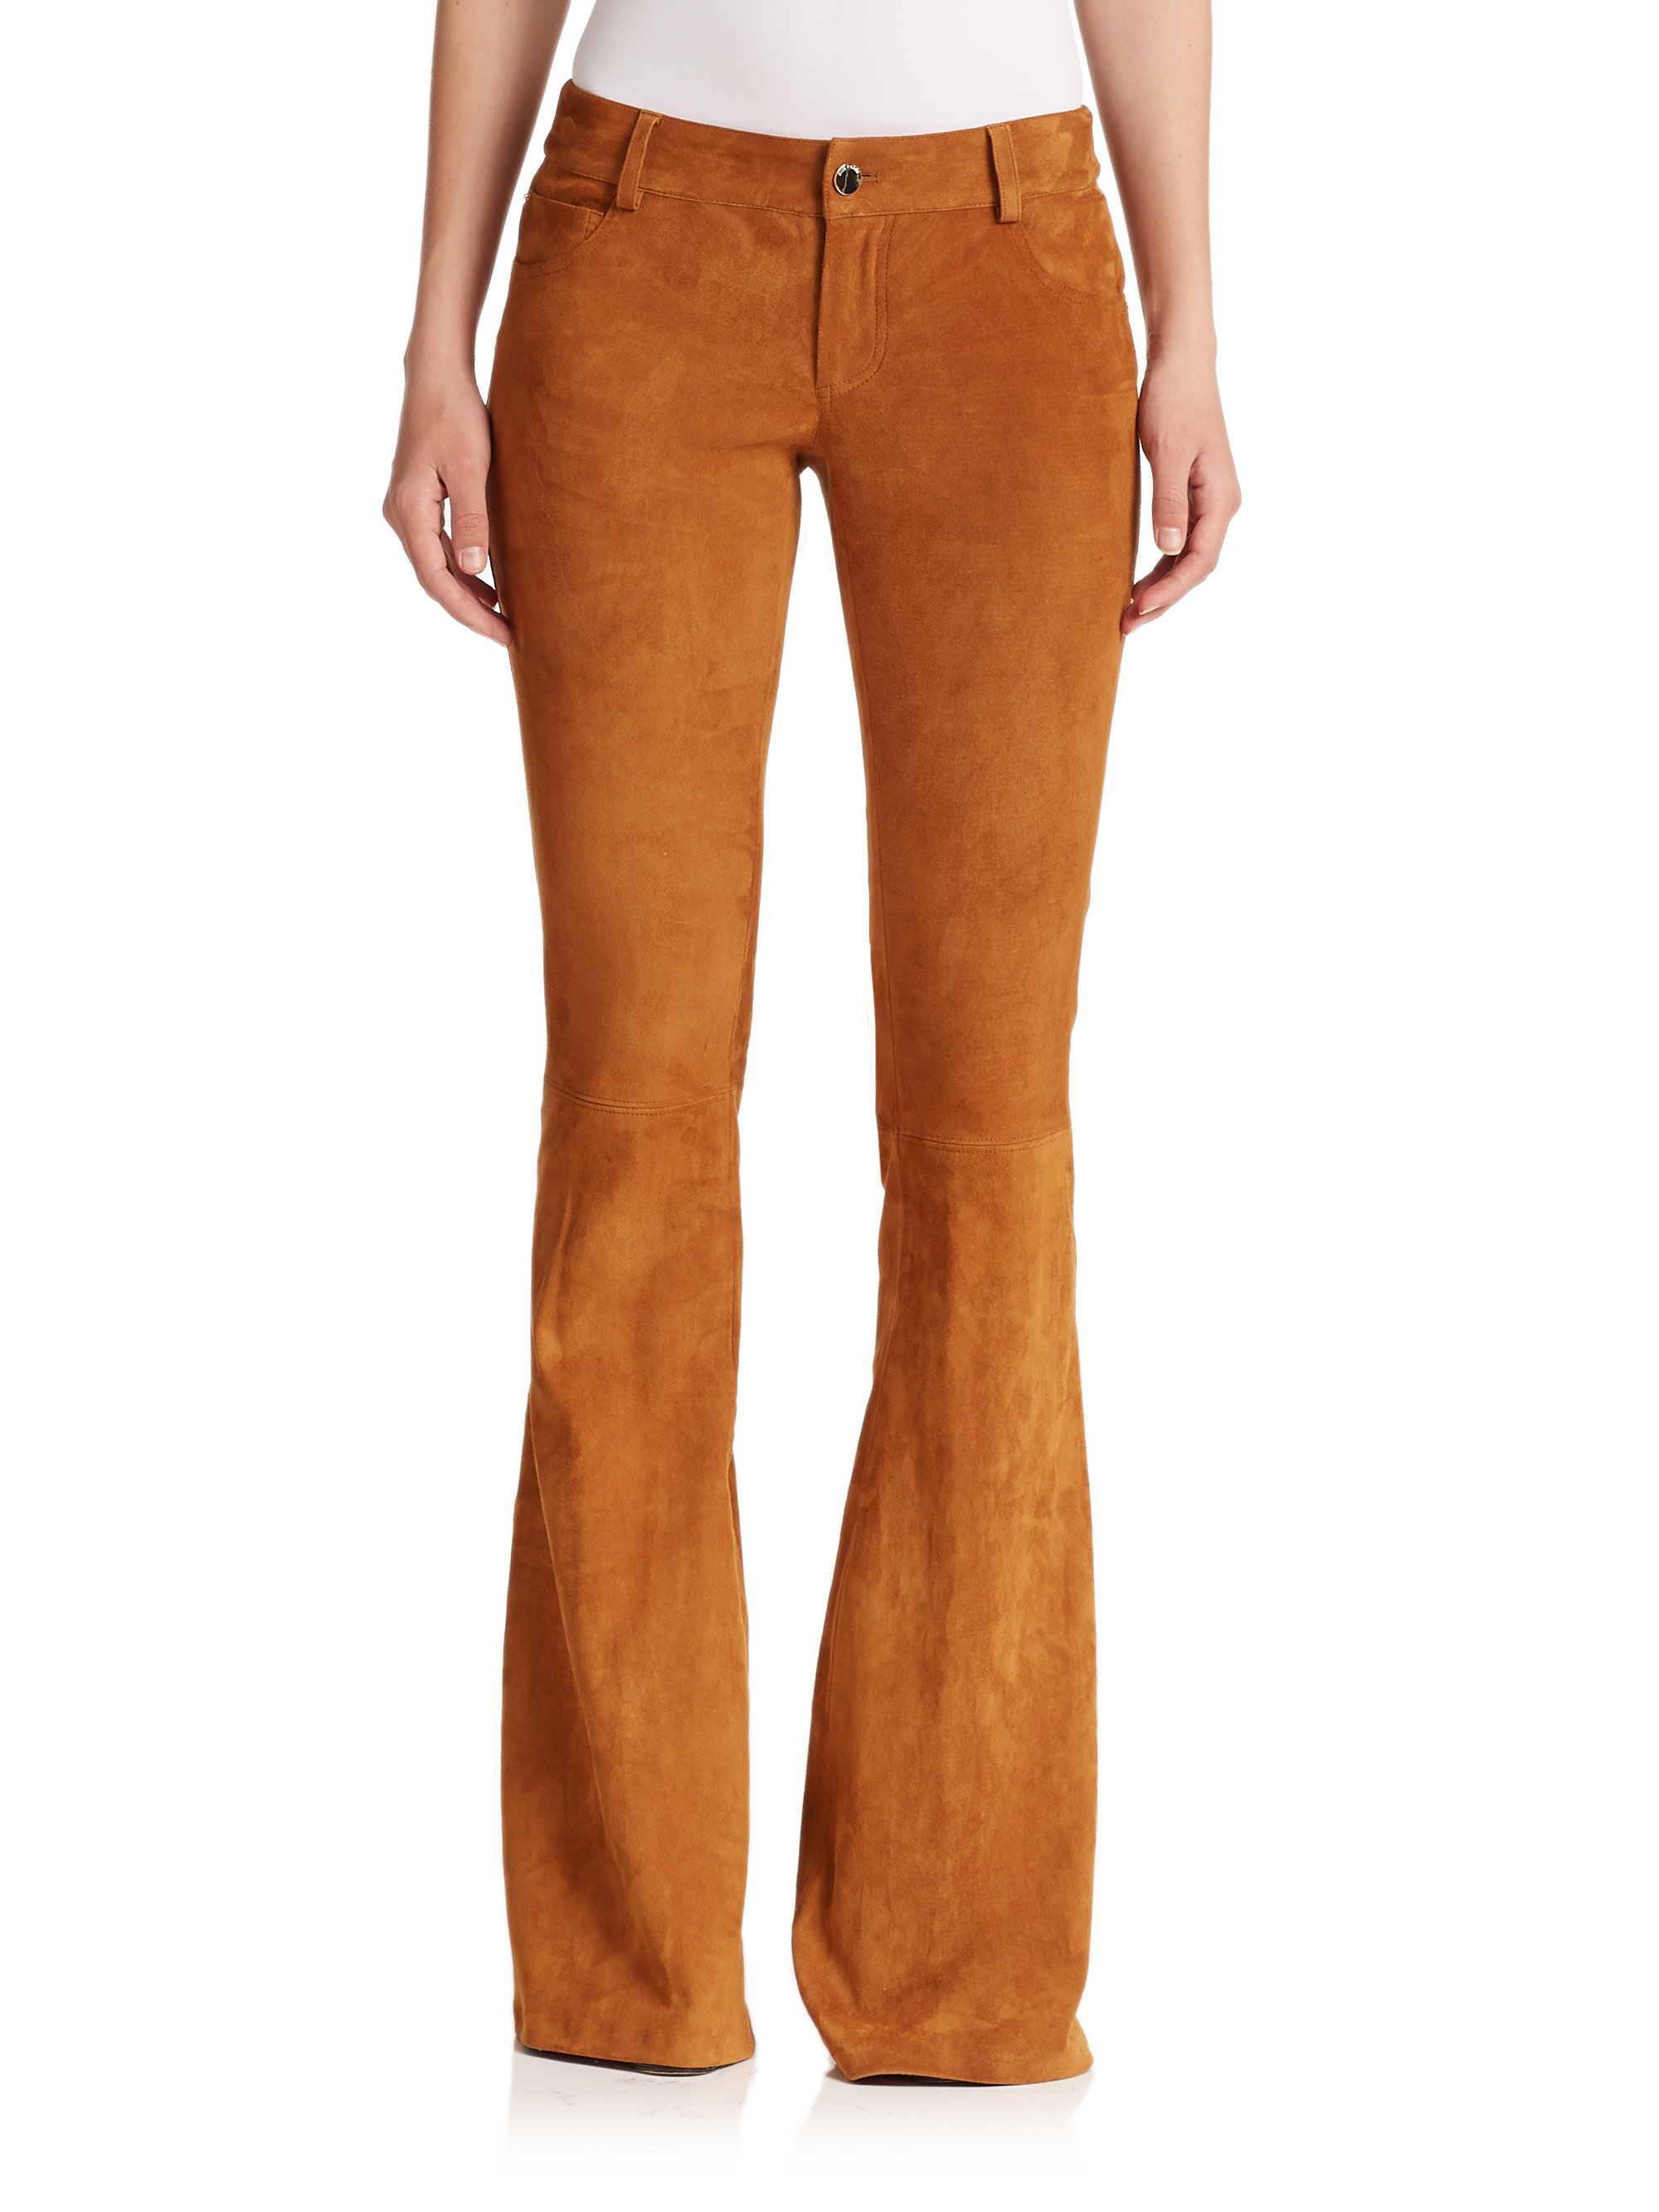 Camel Brown Hair Color Camel Brown Suit Dress Yy Max Mara Prato Camel Hair Coat In Brown Lyst